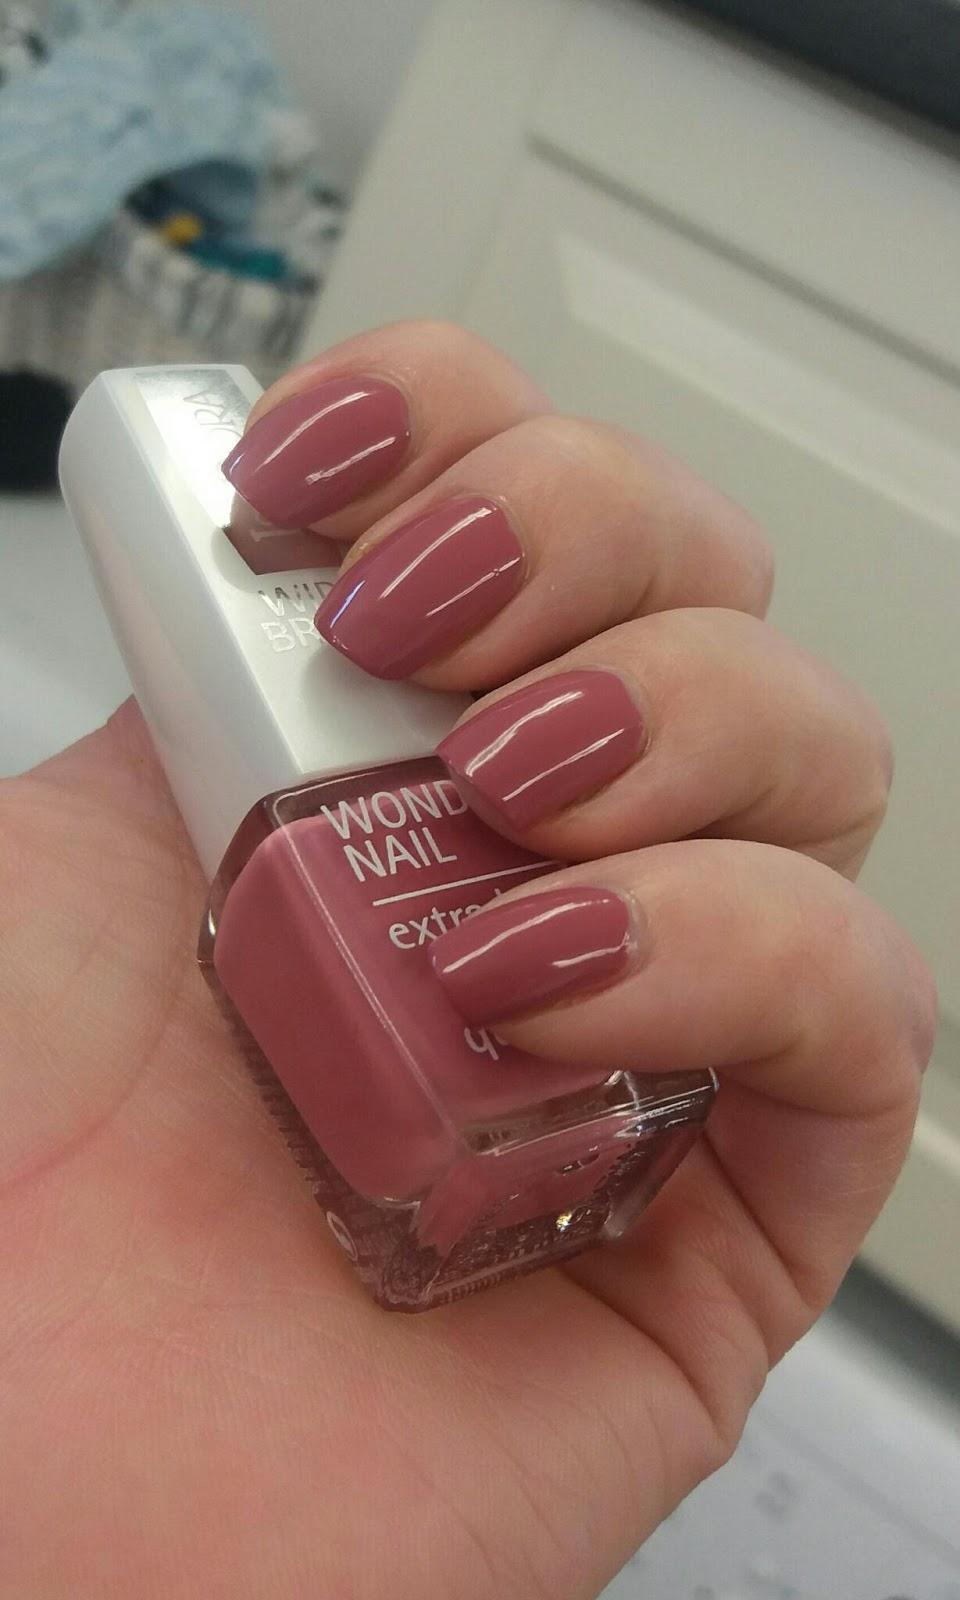 np nails mogna äldre kvinnor